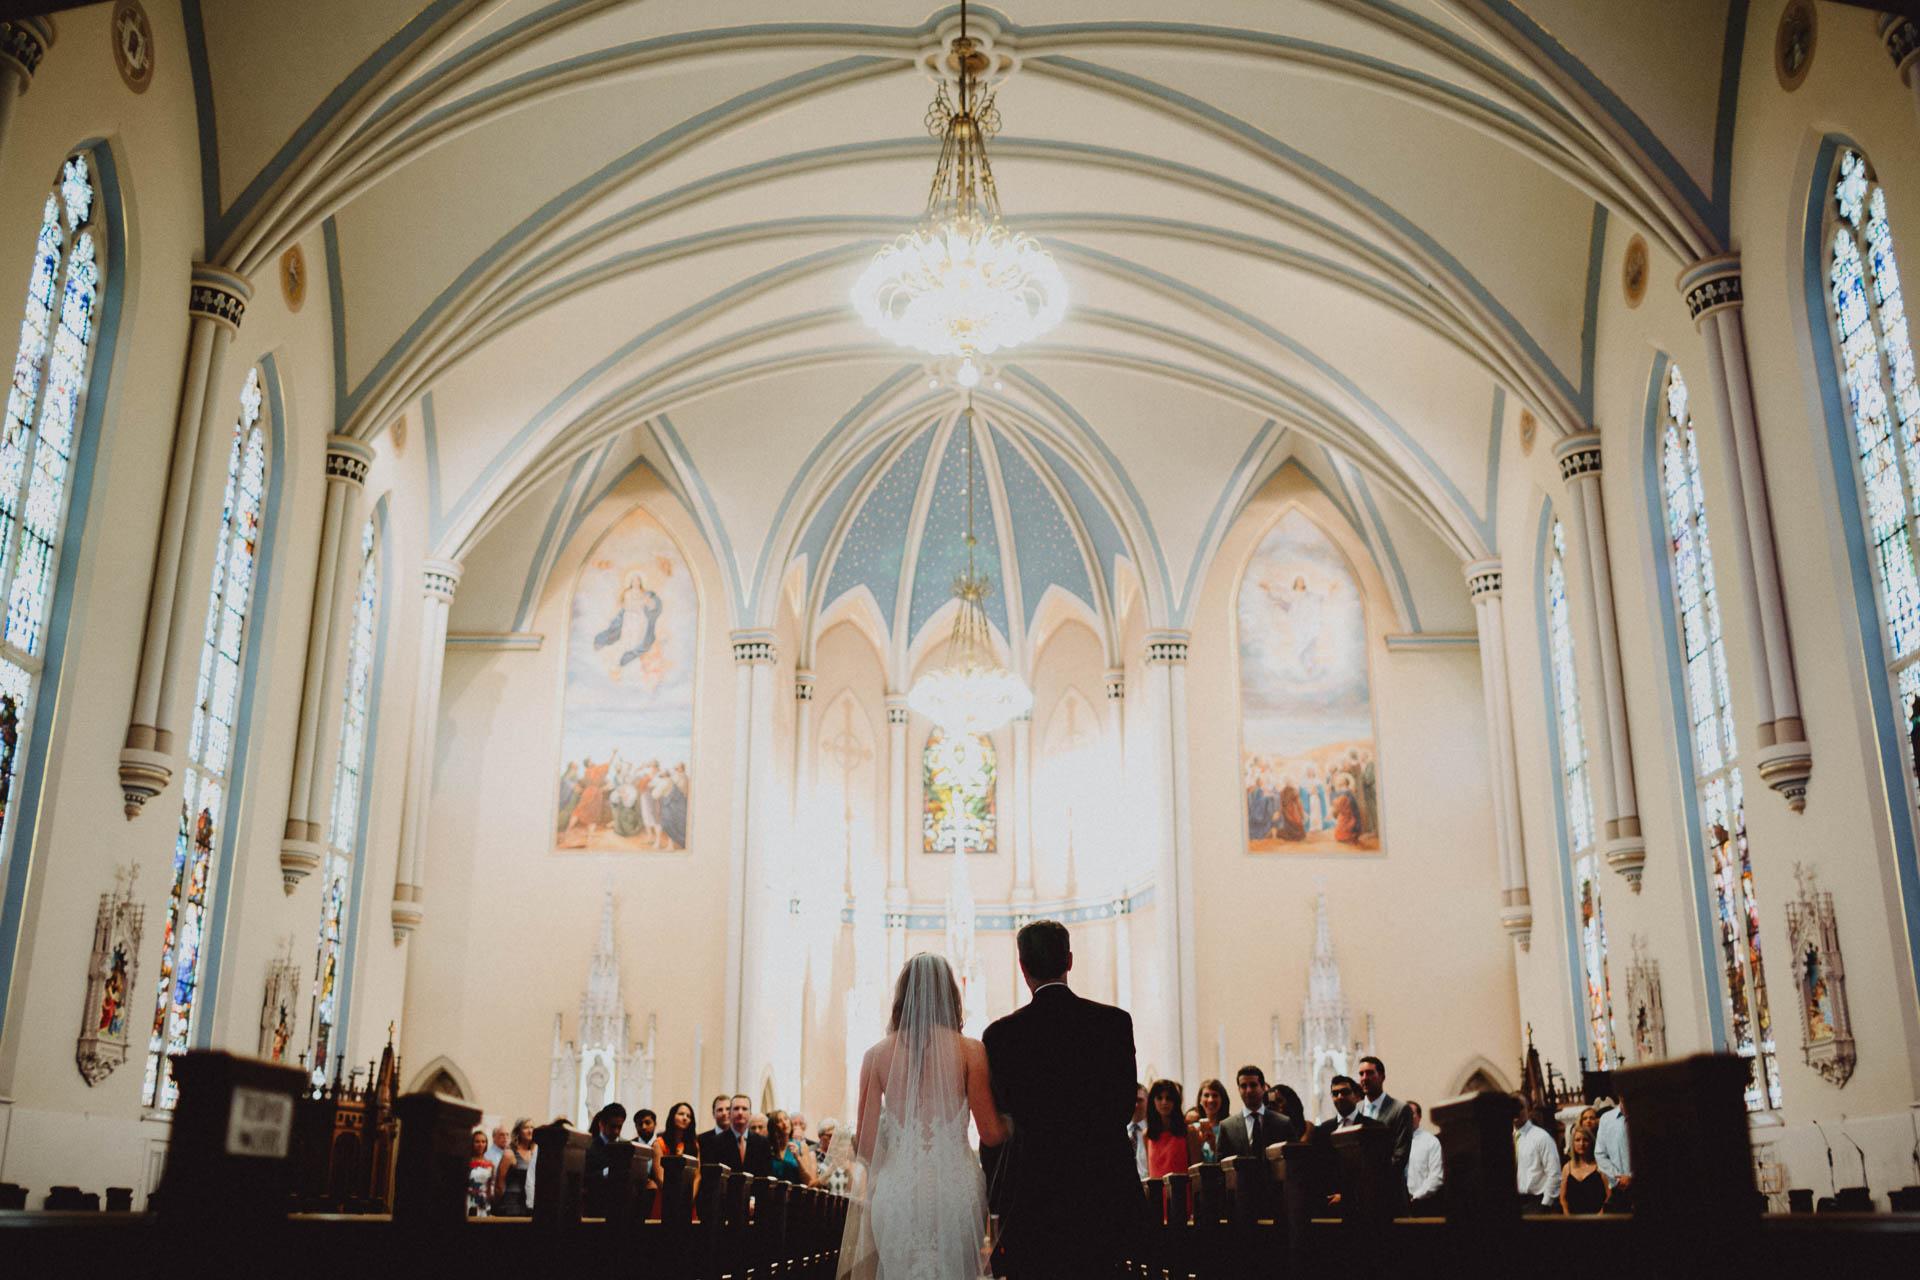 Keri-Joseph-Top-of-the-Market-Wedding-066@2x.jpg